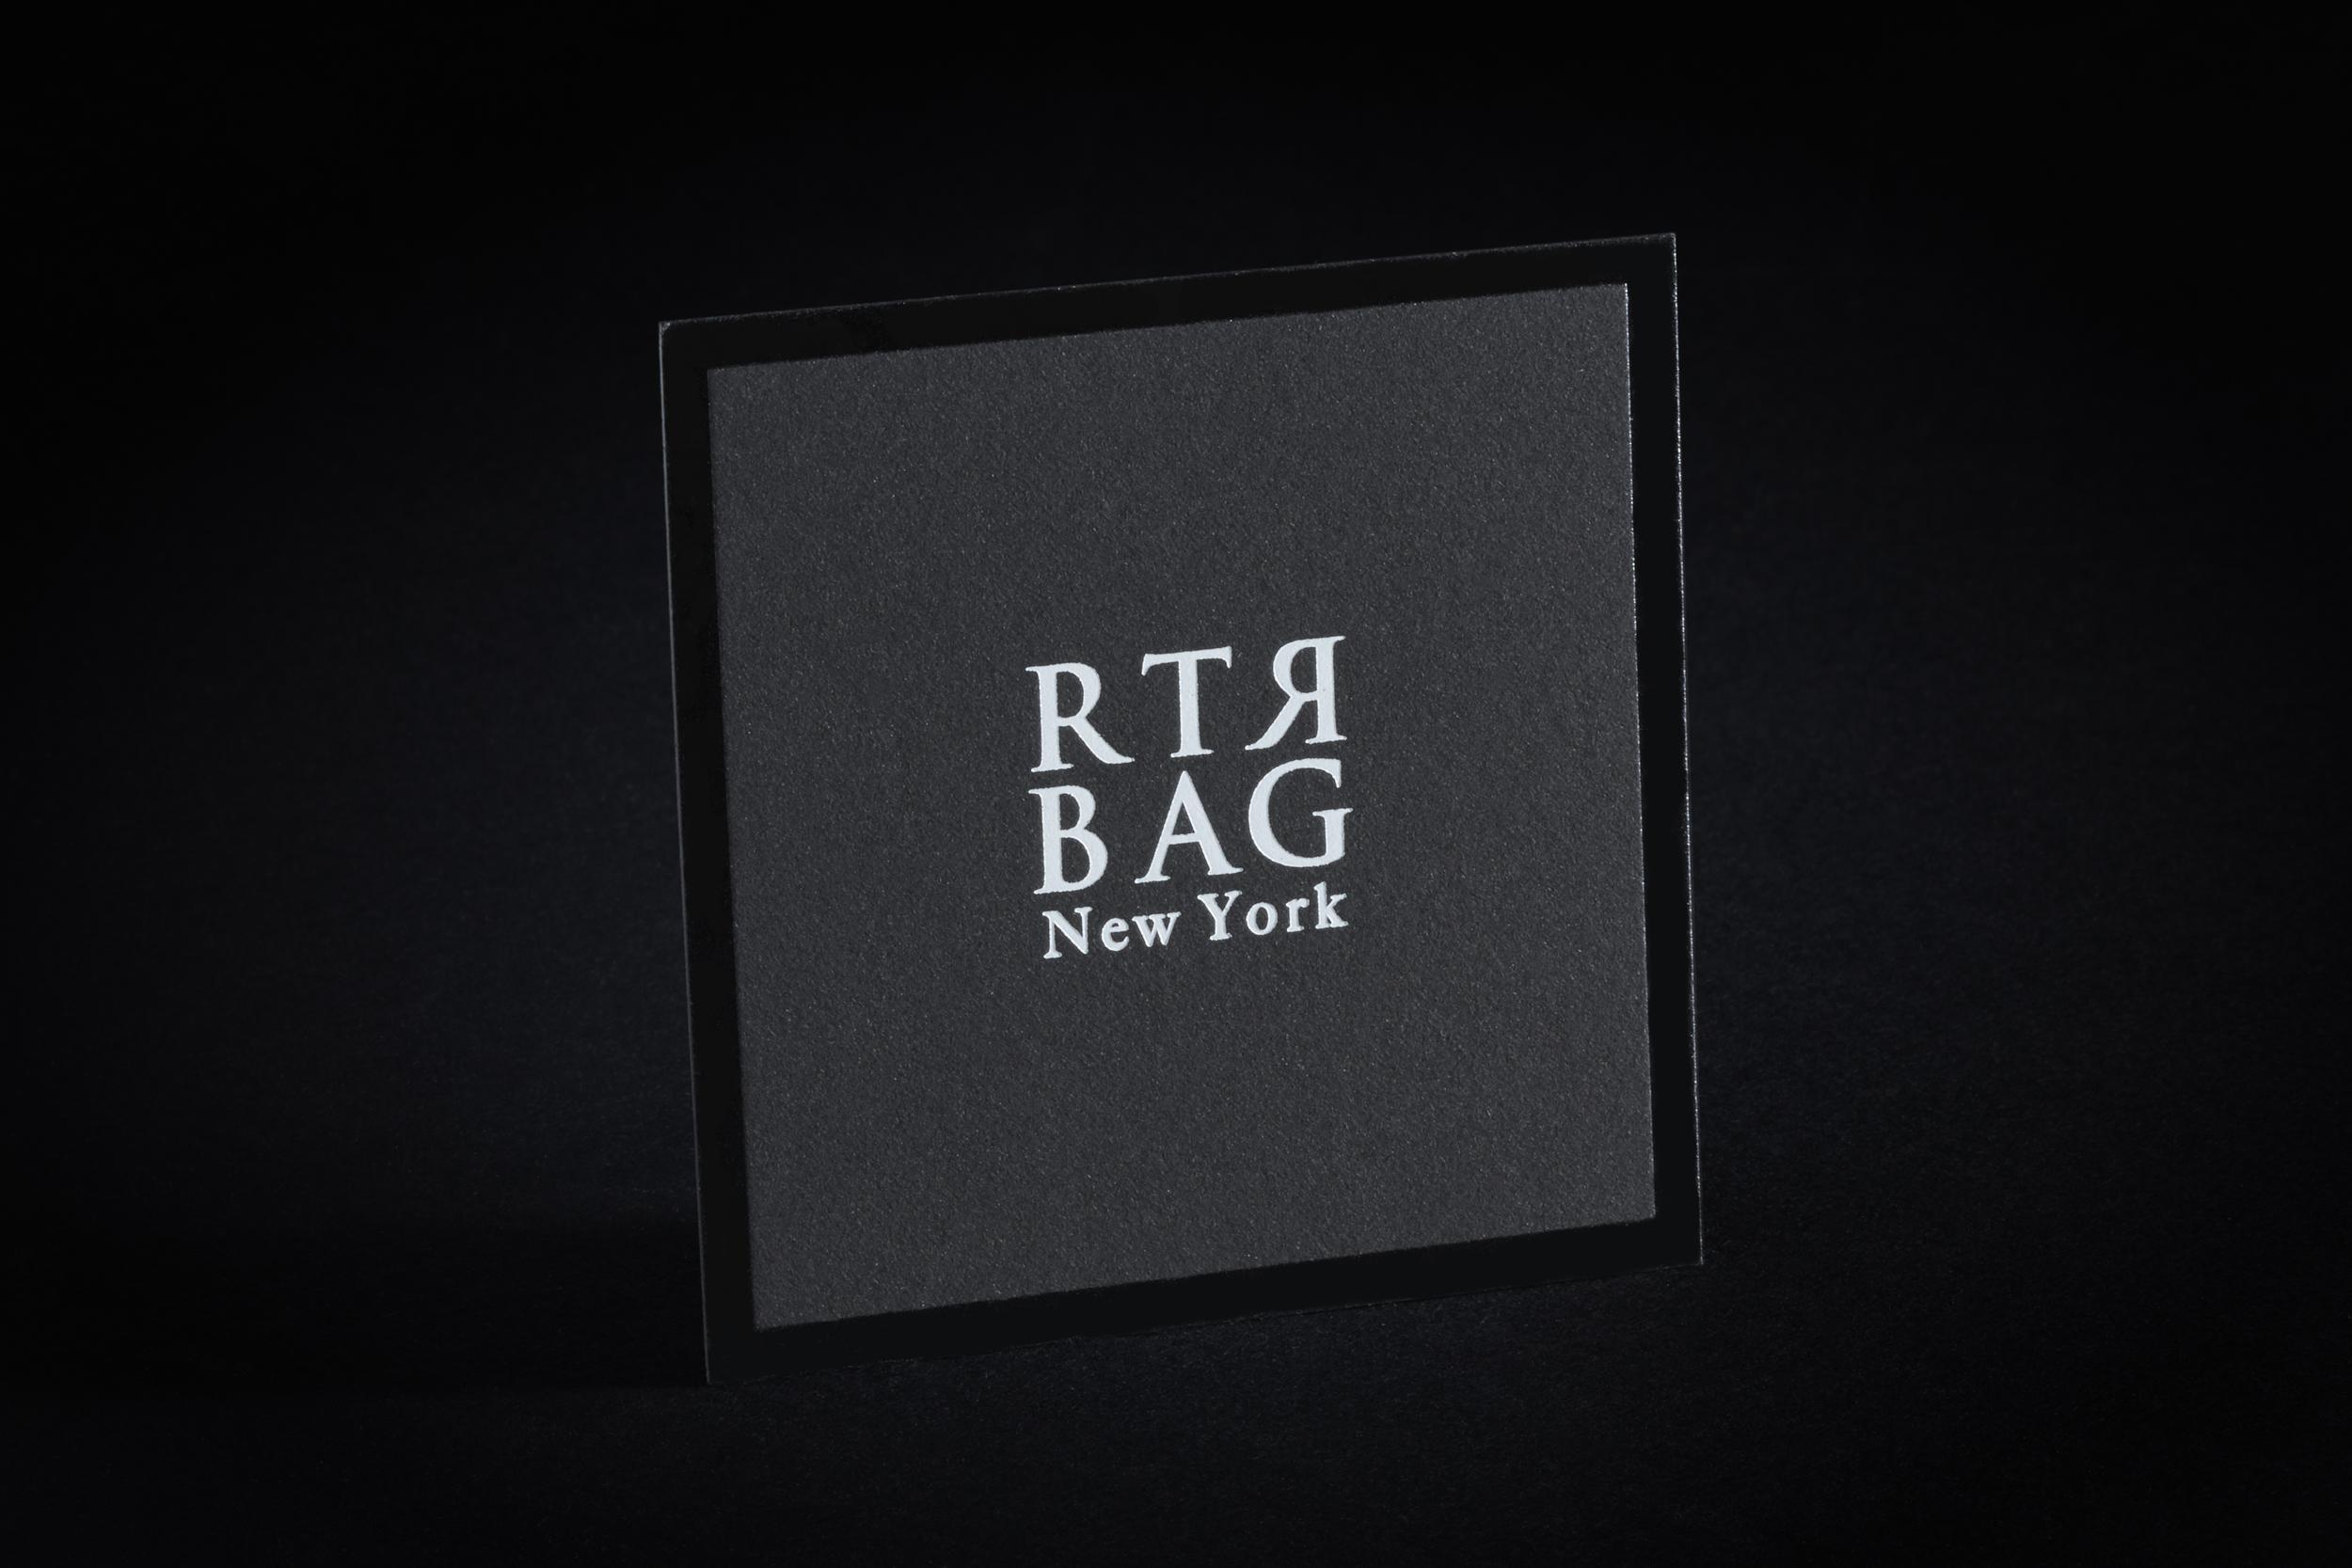 RTR BAG Co.